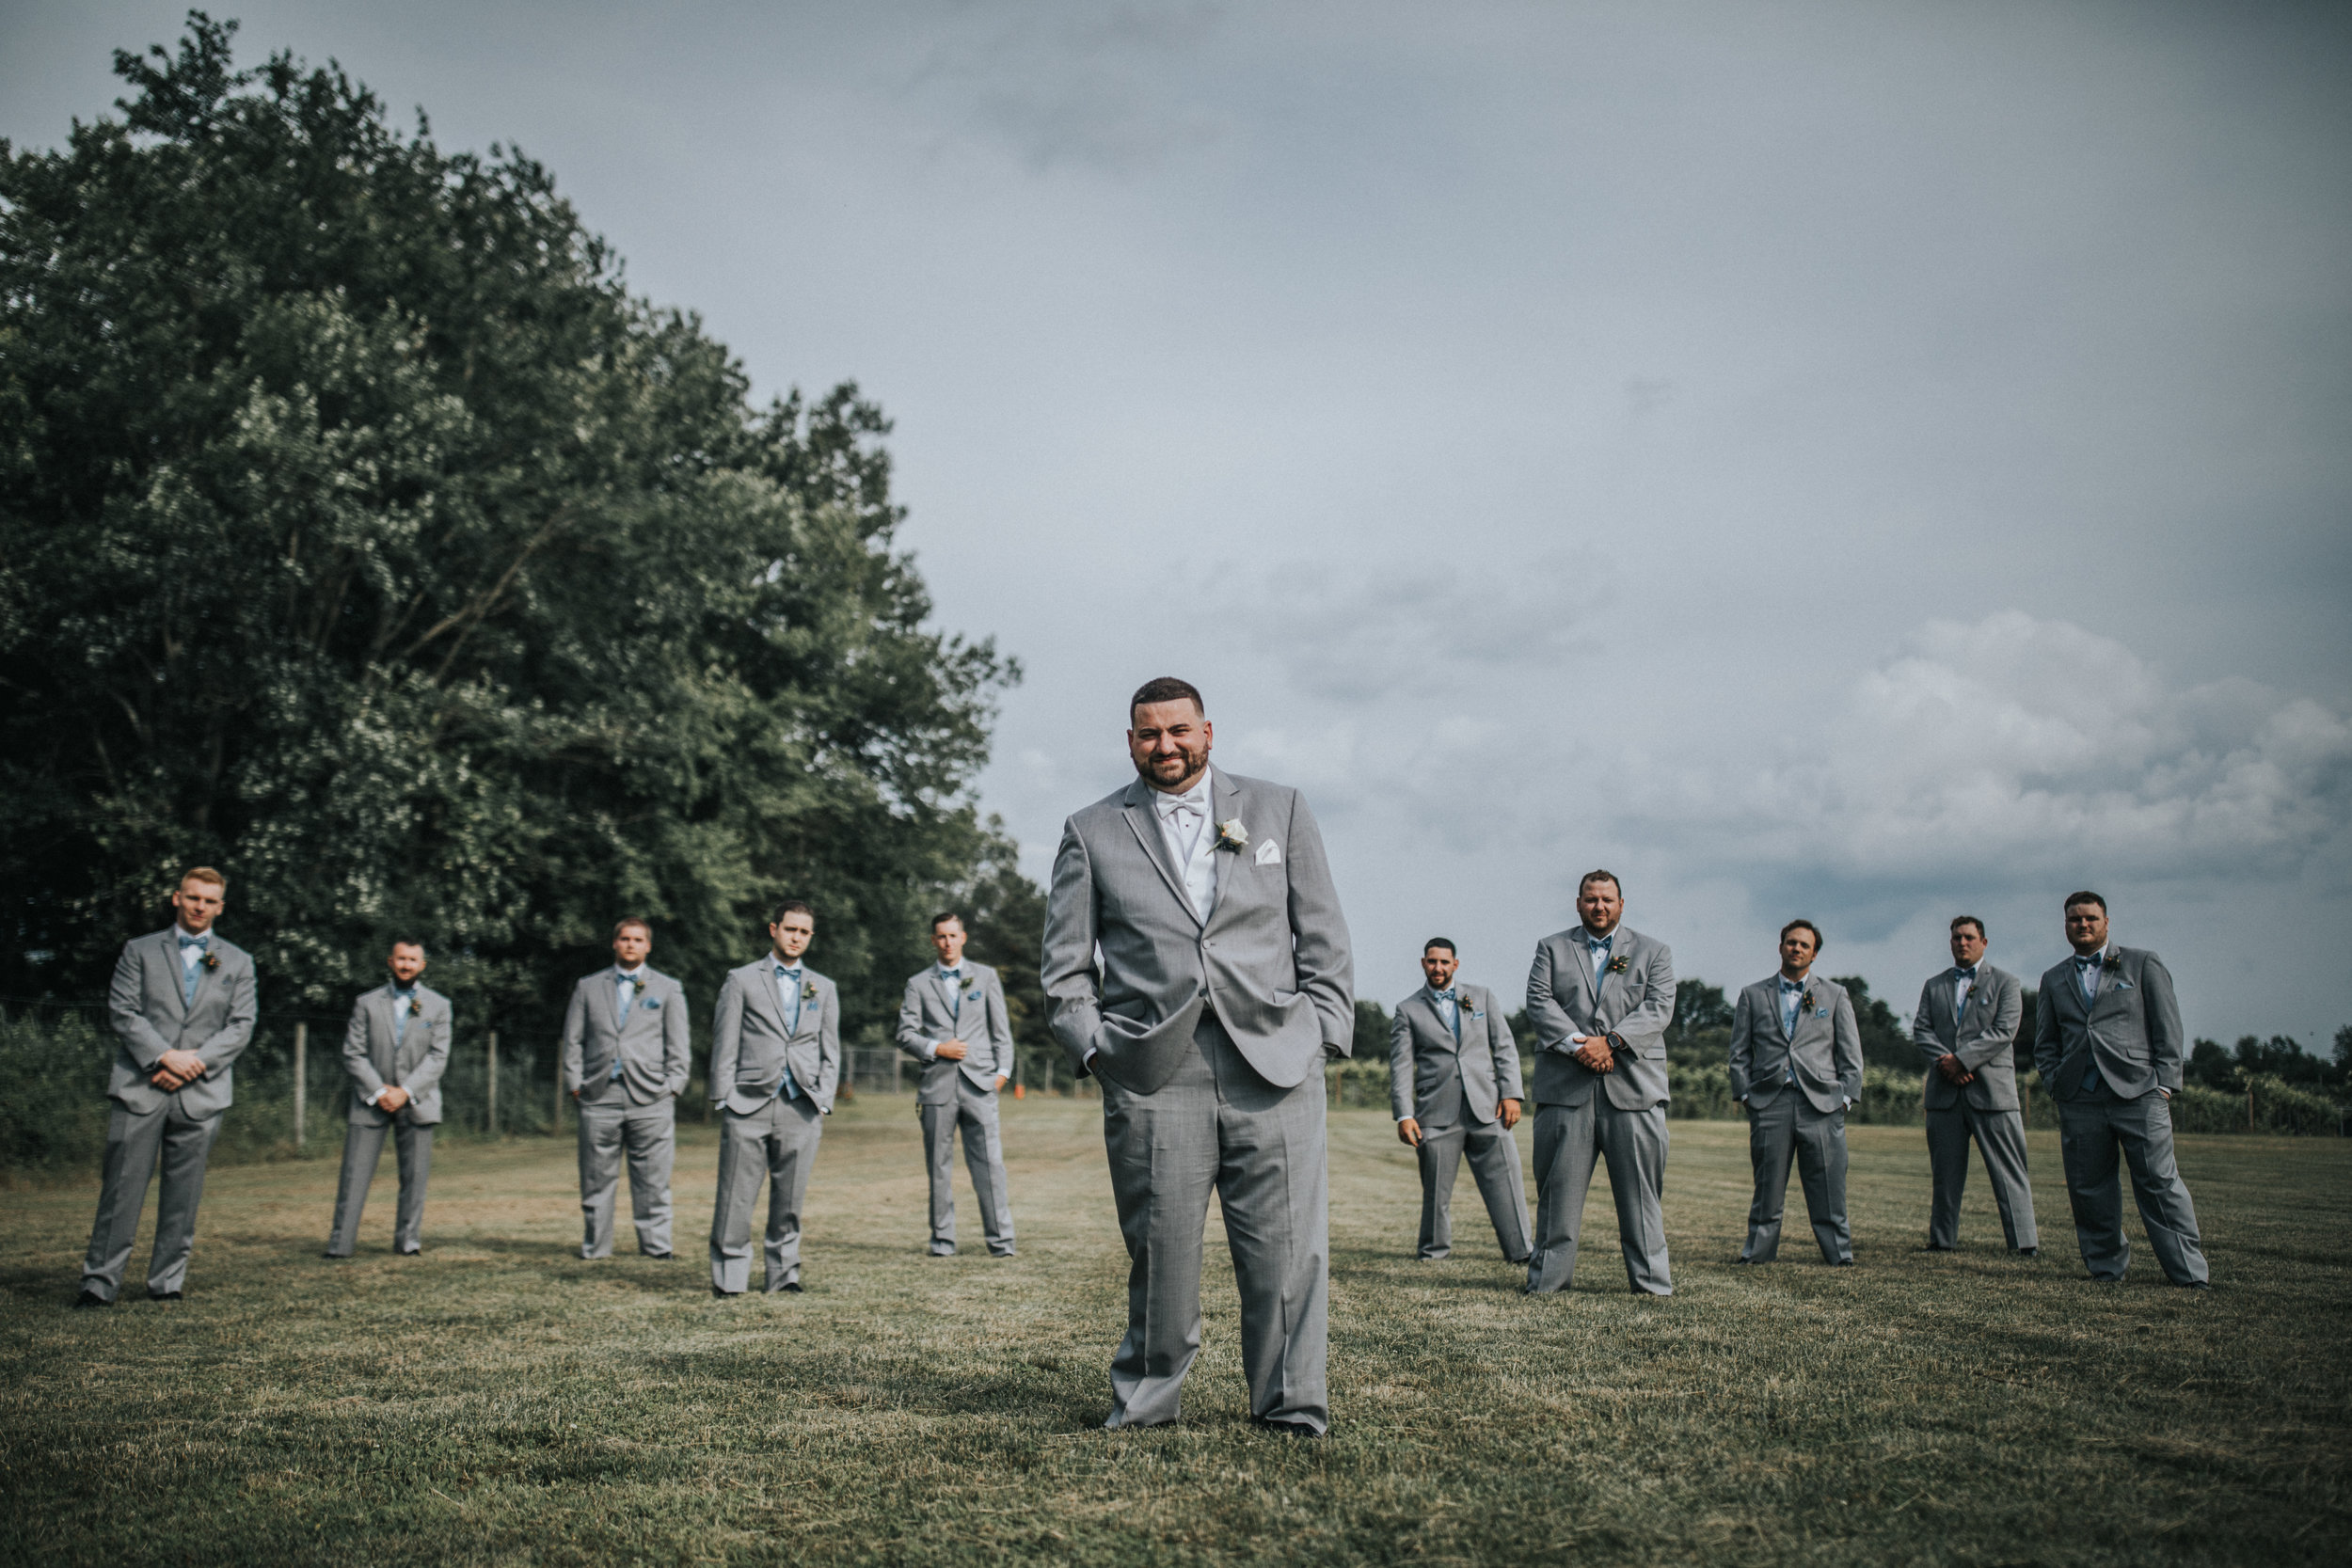 New-Jersey-Wedding-Photographer-JennaLynnPhotography-ValenzanoWinery-BridalParty-69.jpg